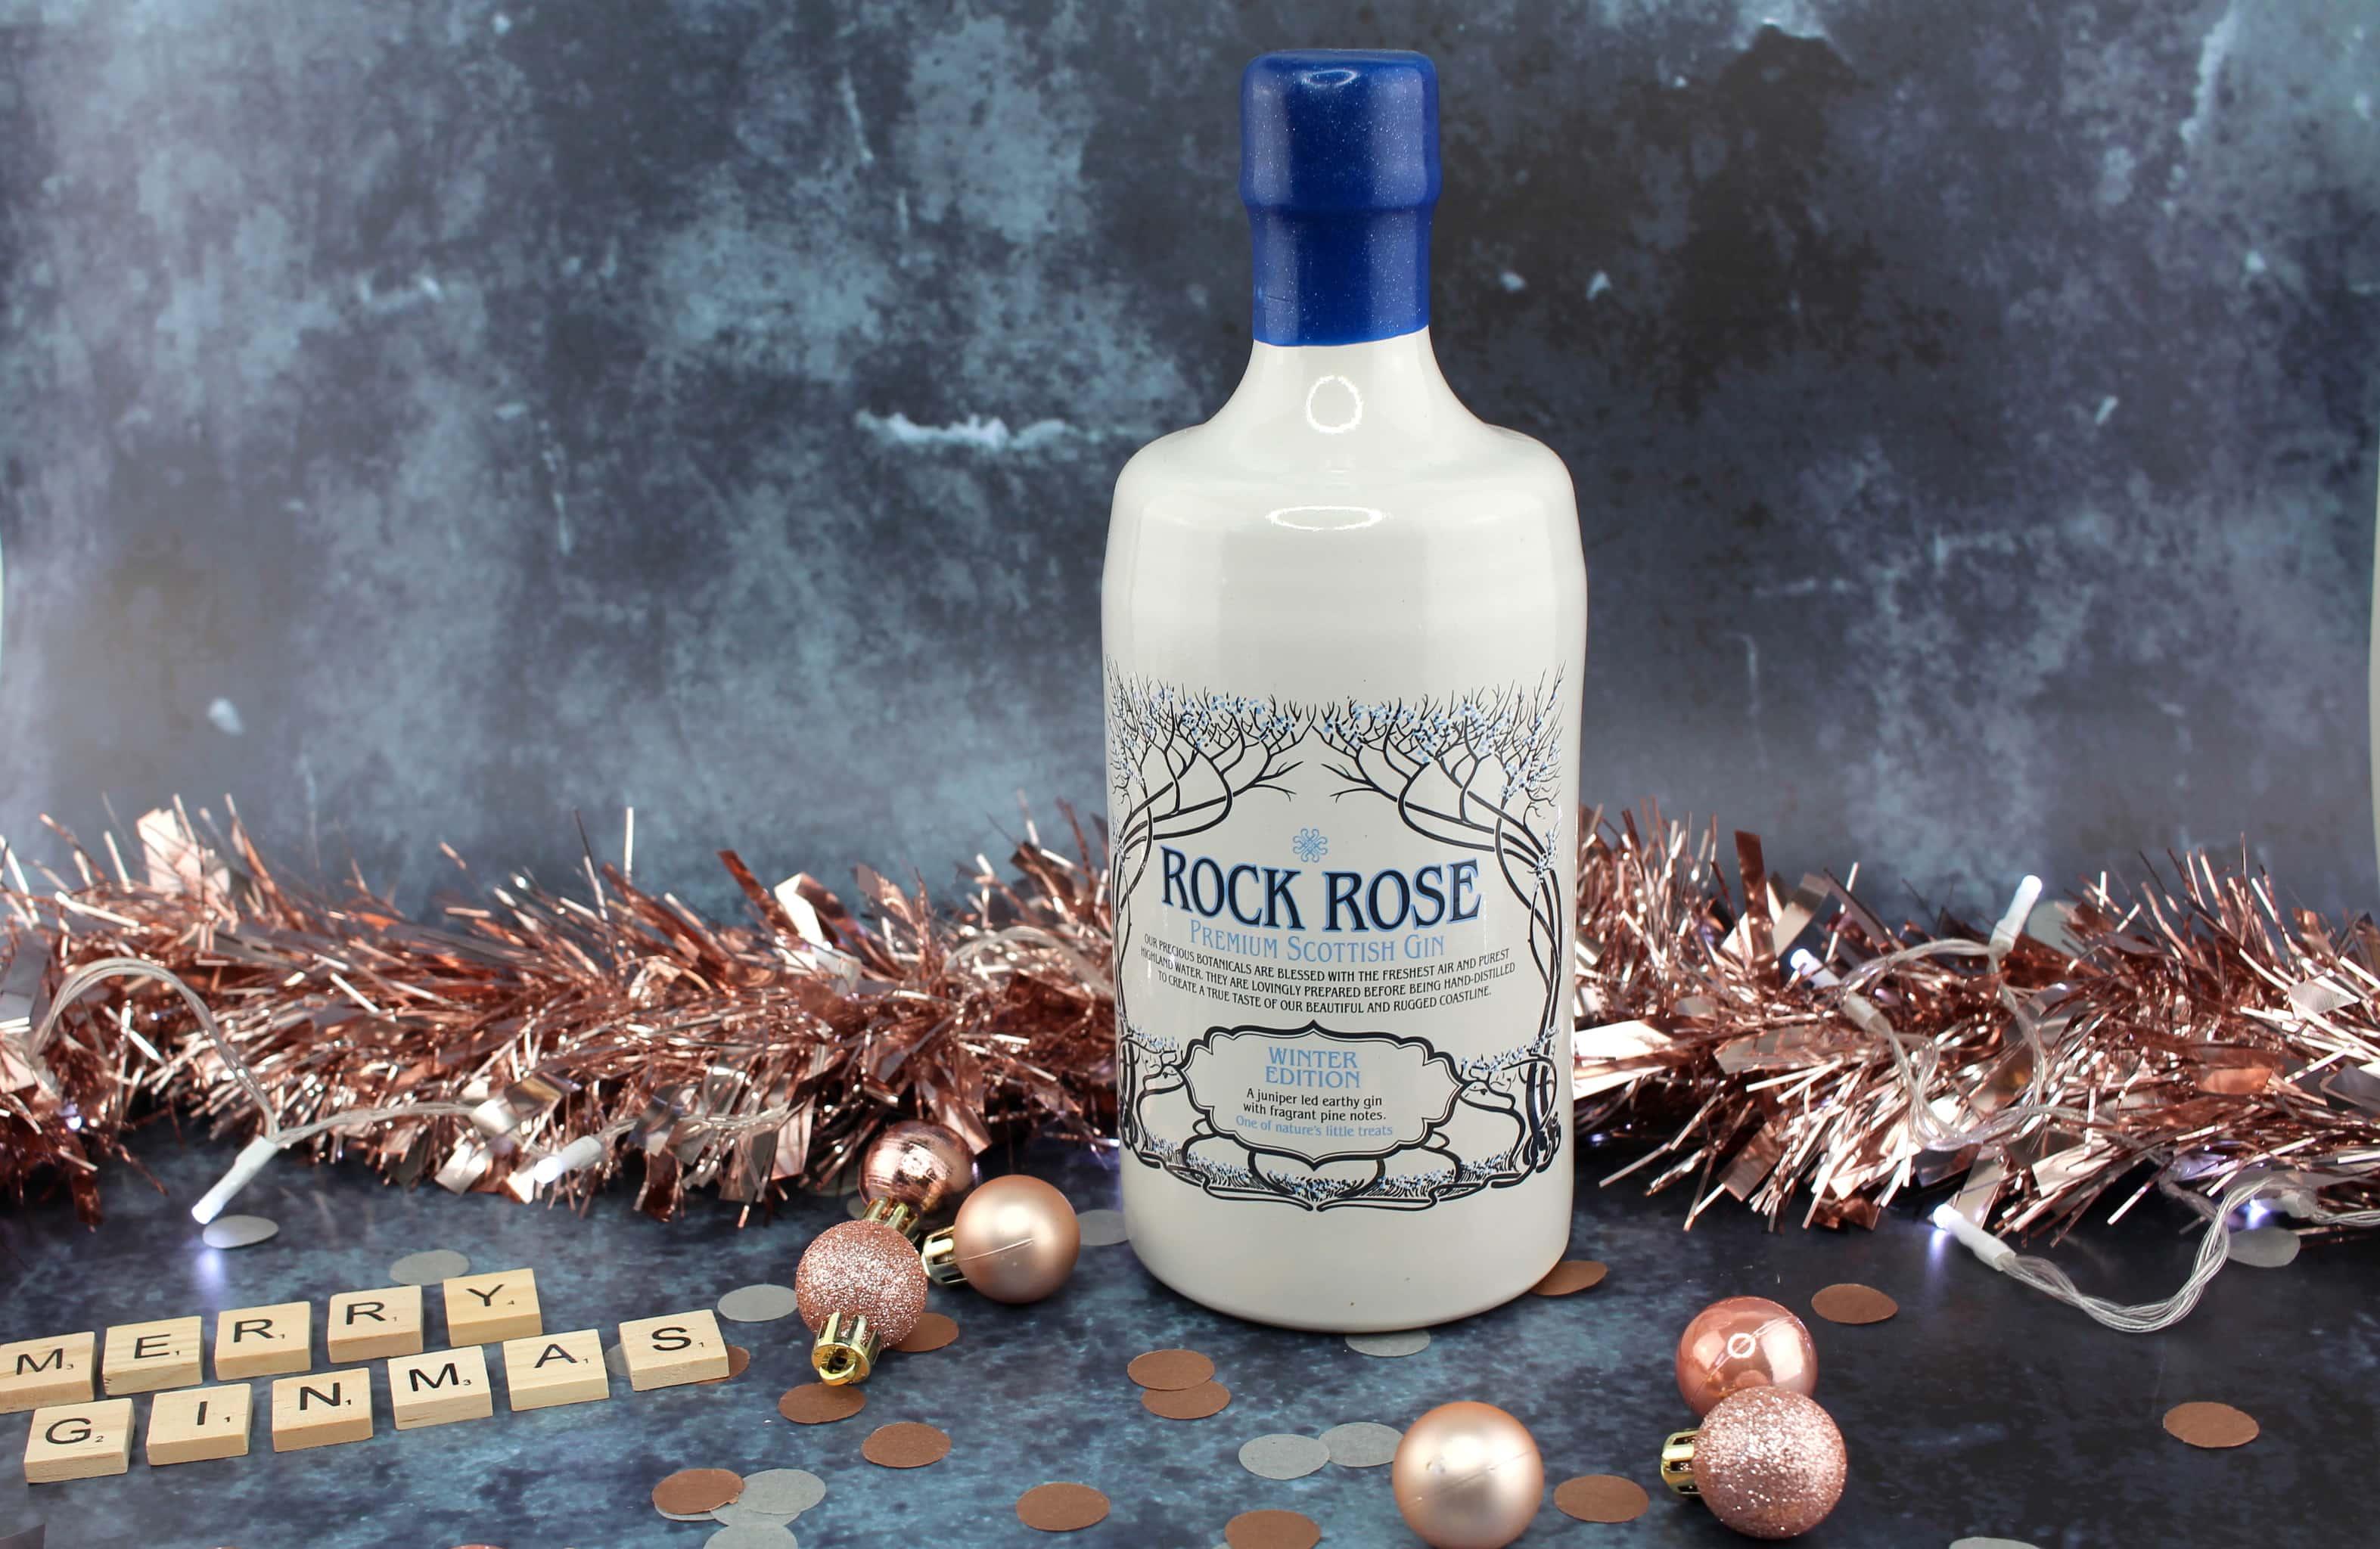 Rock Rose winter edition